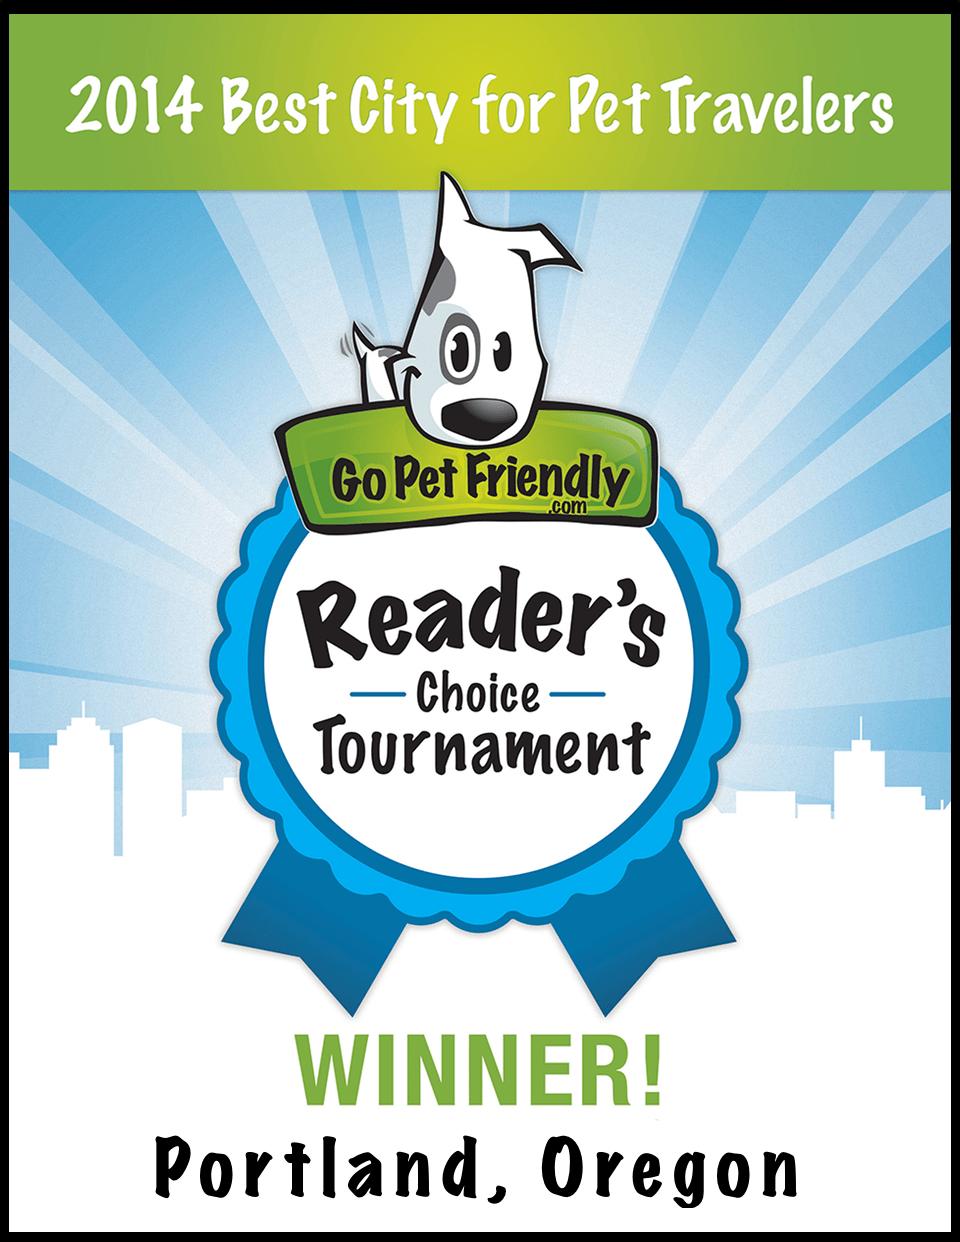 GPF_Award_Winner - Portland, OR